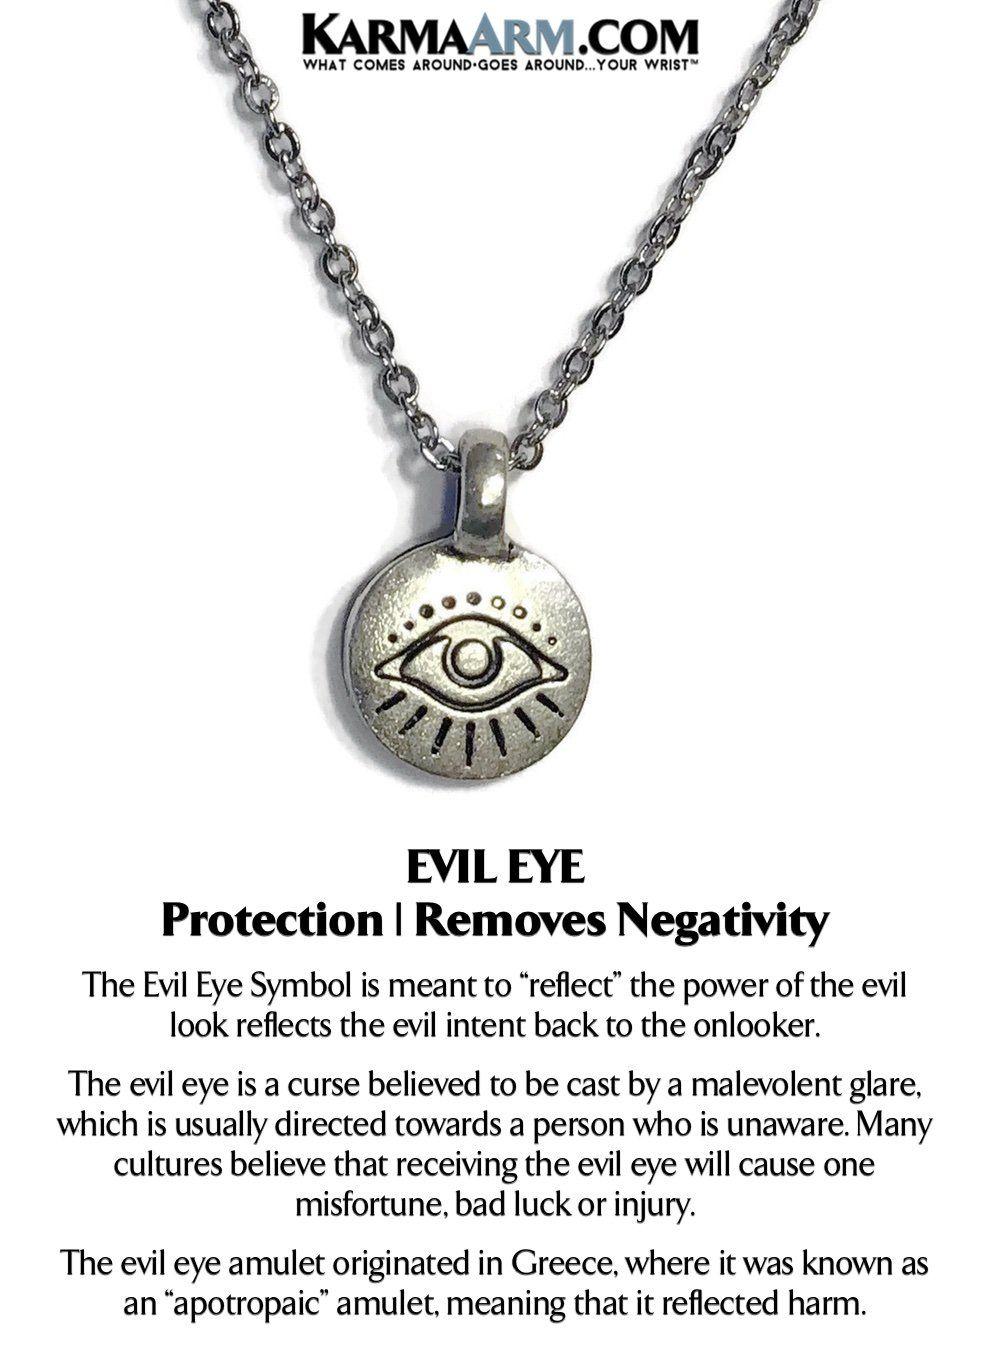 a8638e9634 #beaded #necklaces #meditation 💠 #evil #eye #evileye #friendship #shopstyle  #gifts #love #joy #depression #sexuality #anxiety #yoga #healing #wisdom ...